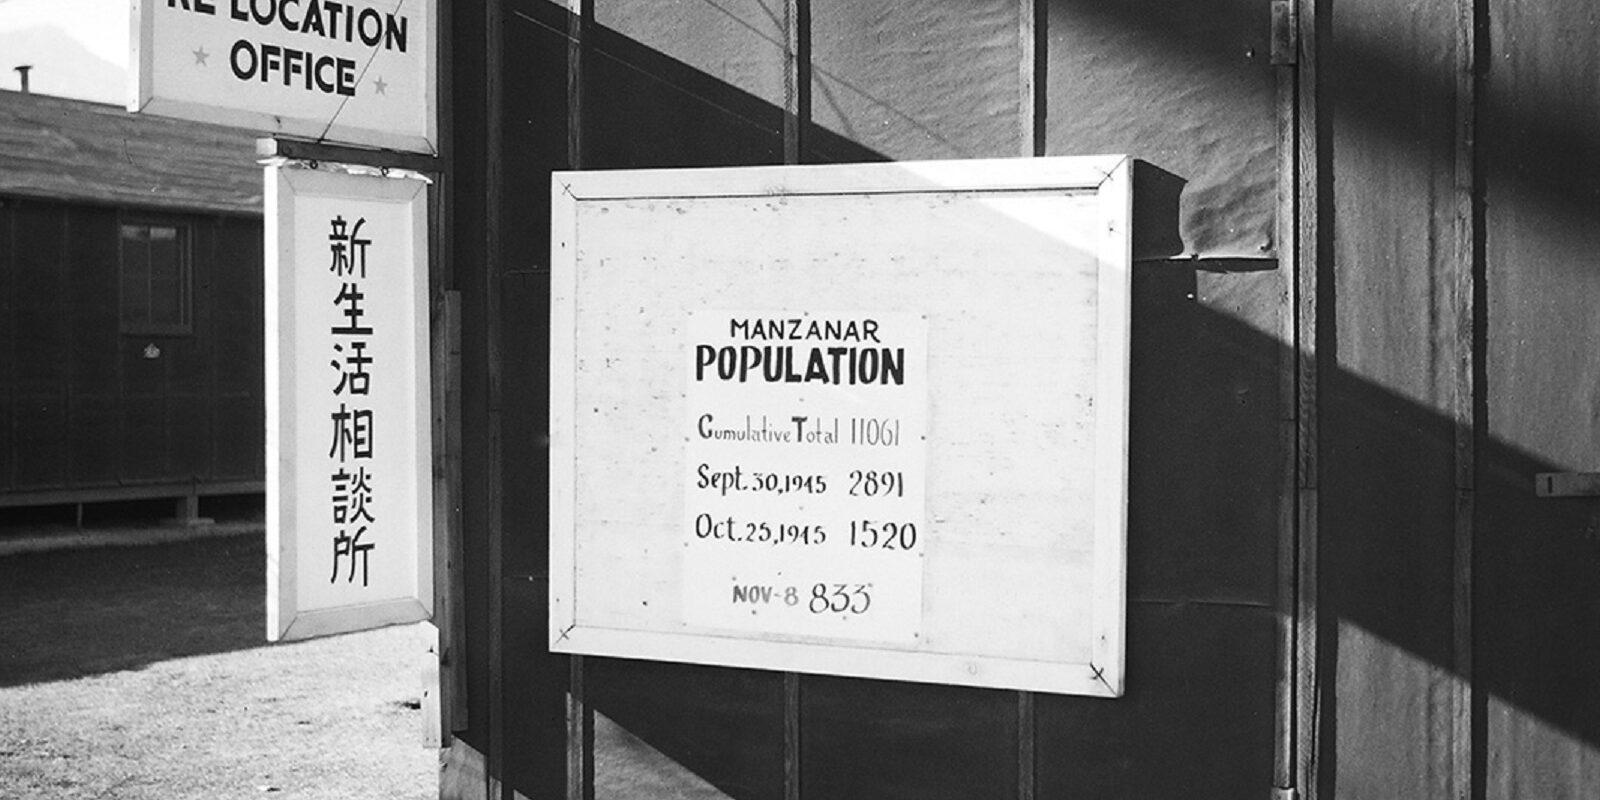 The Manzanar Relocation Office